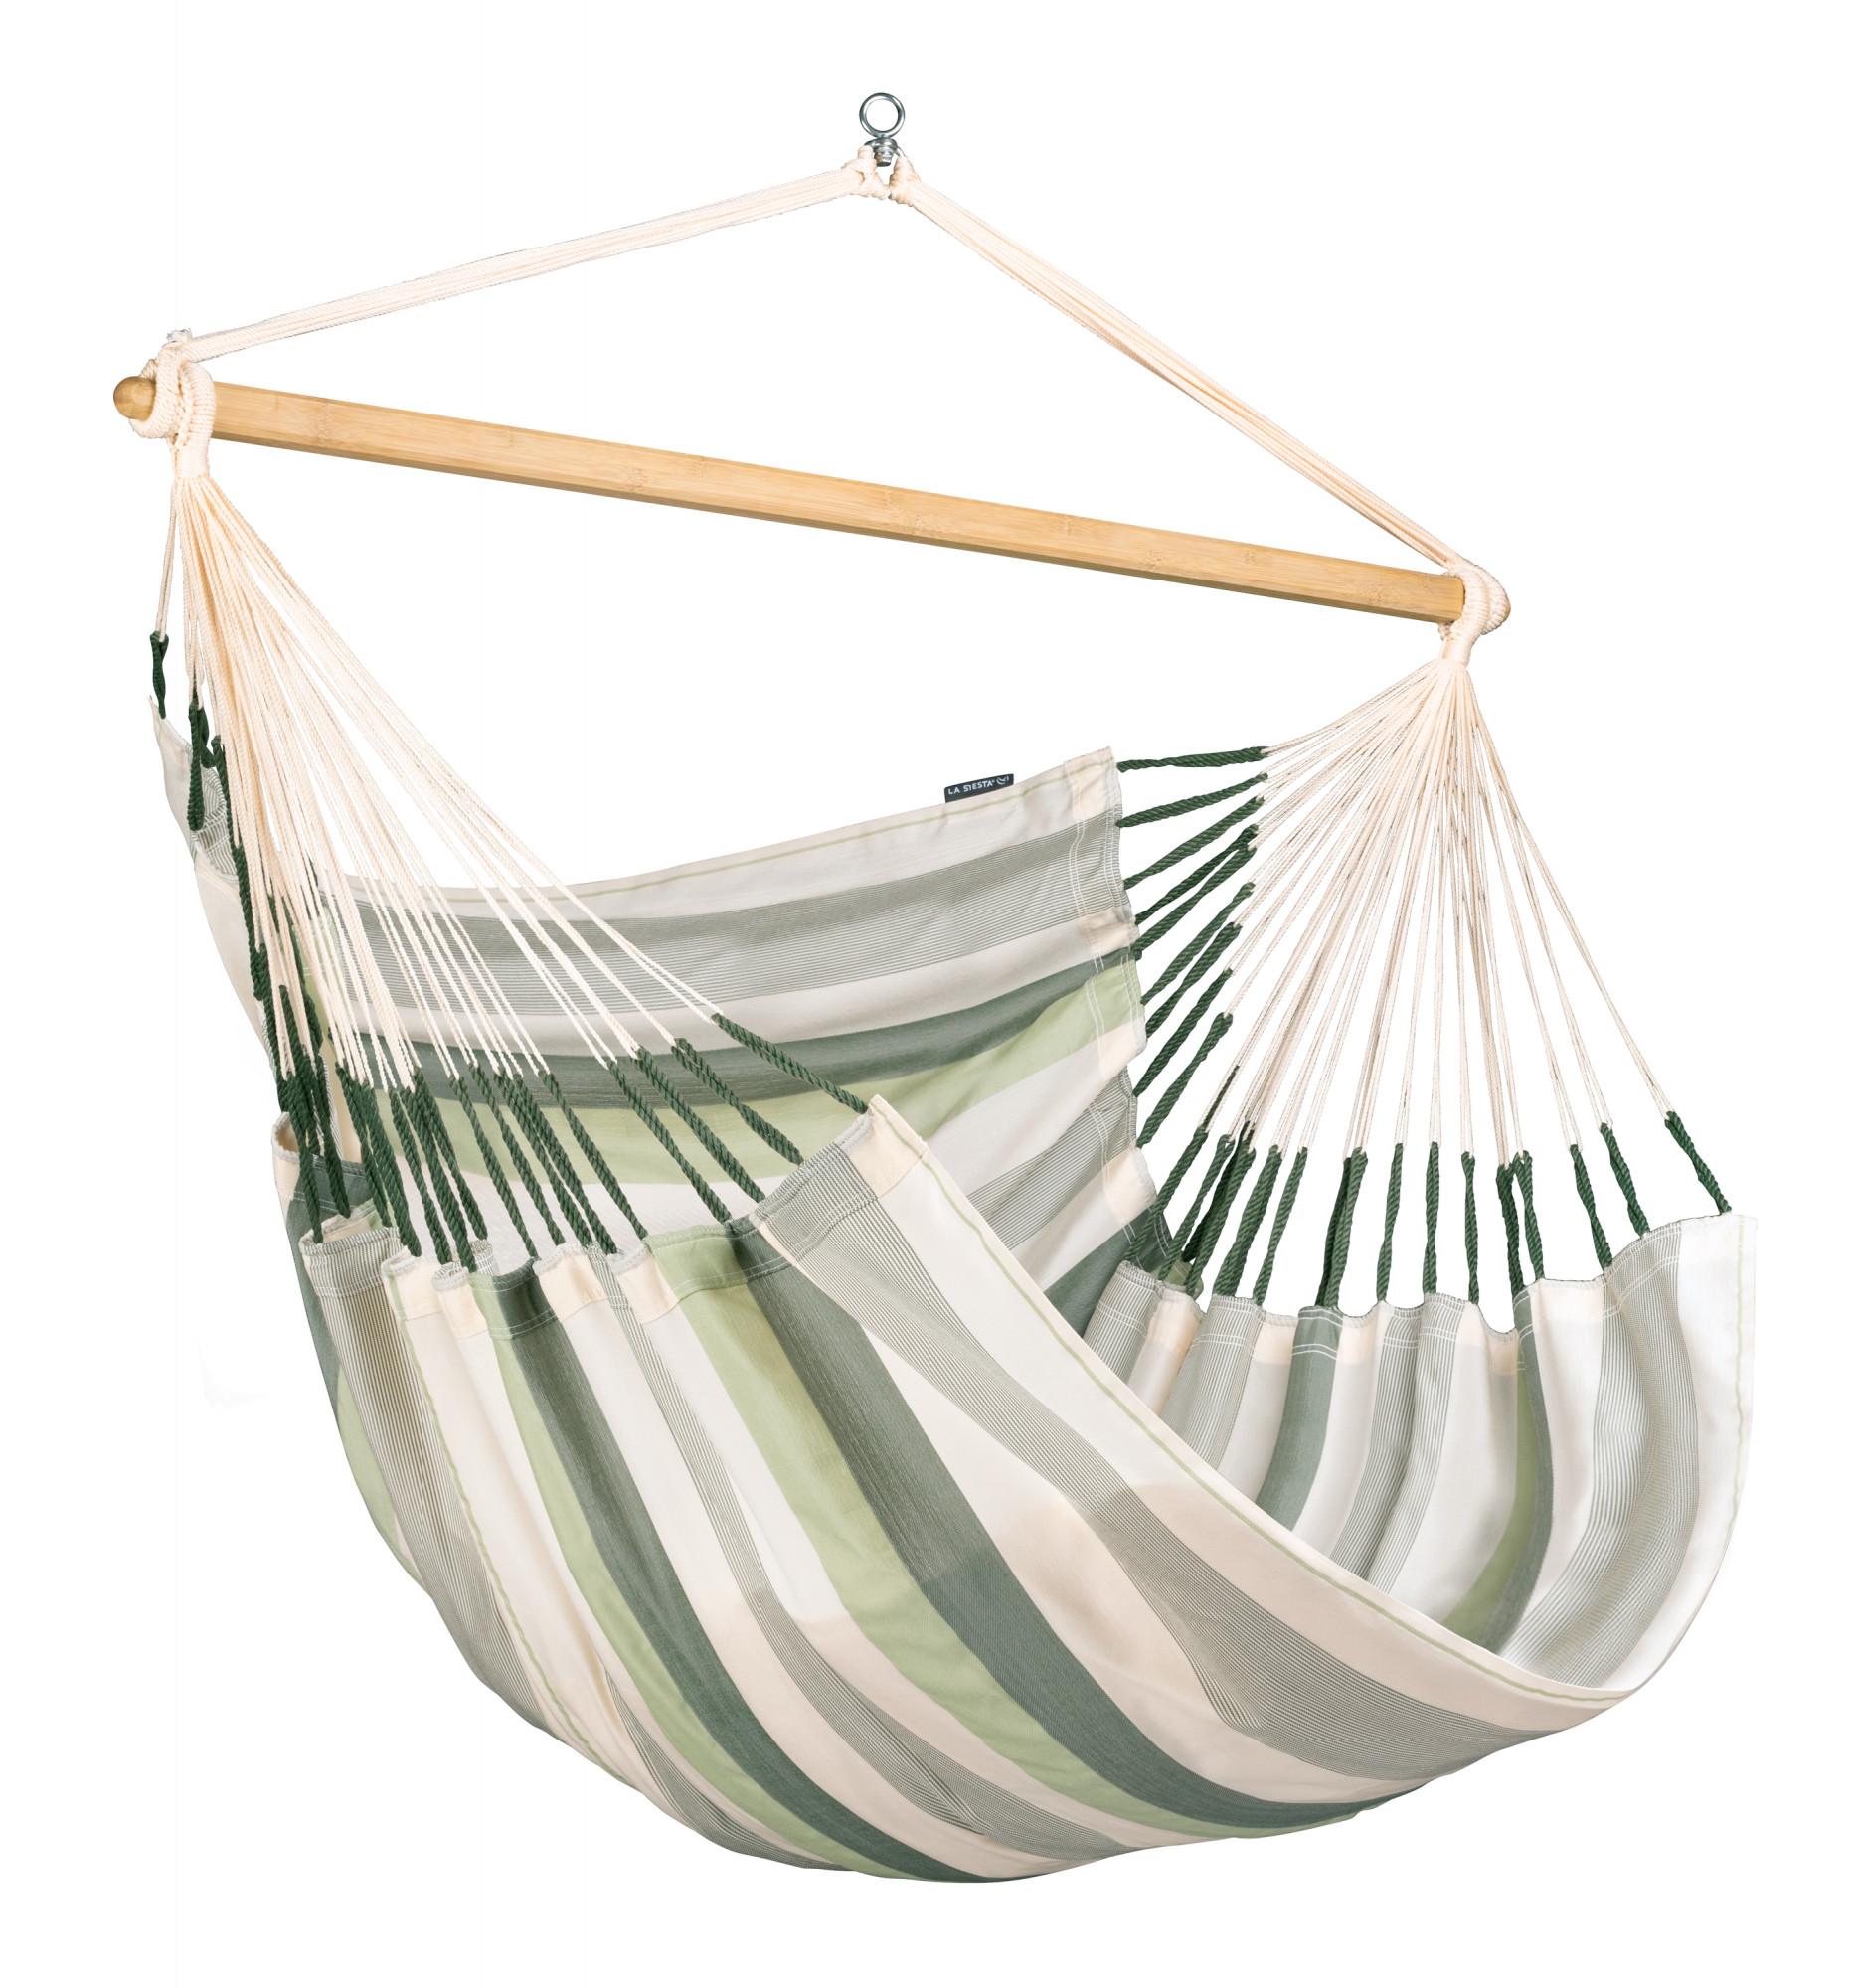 Chaise-hamac kingsize en tissu vert clair